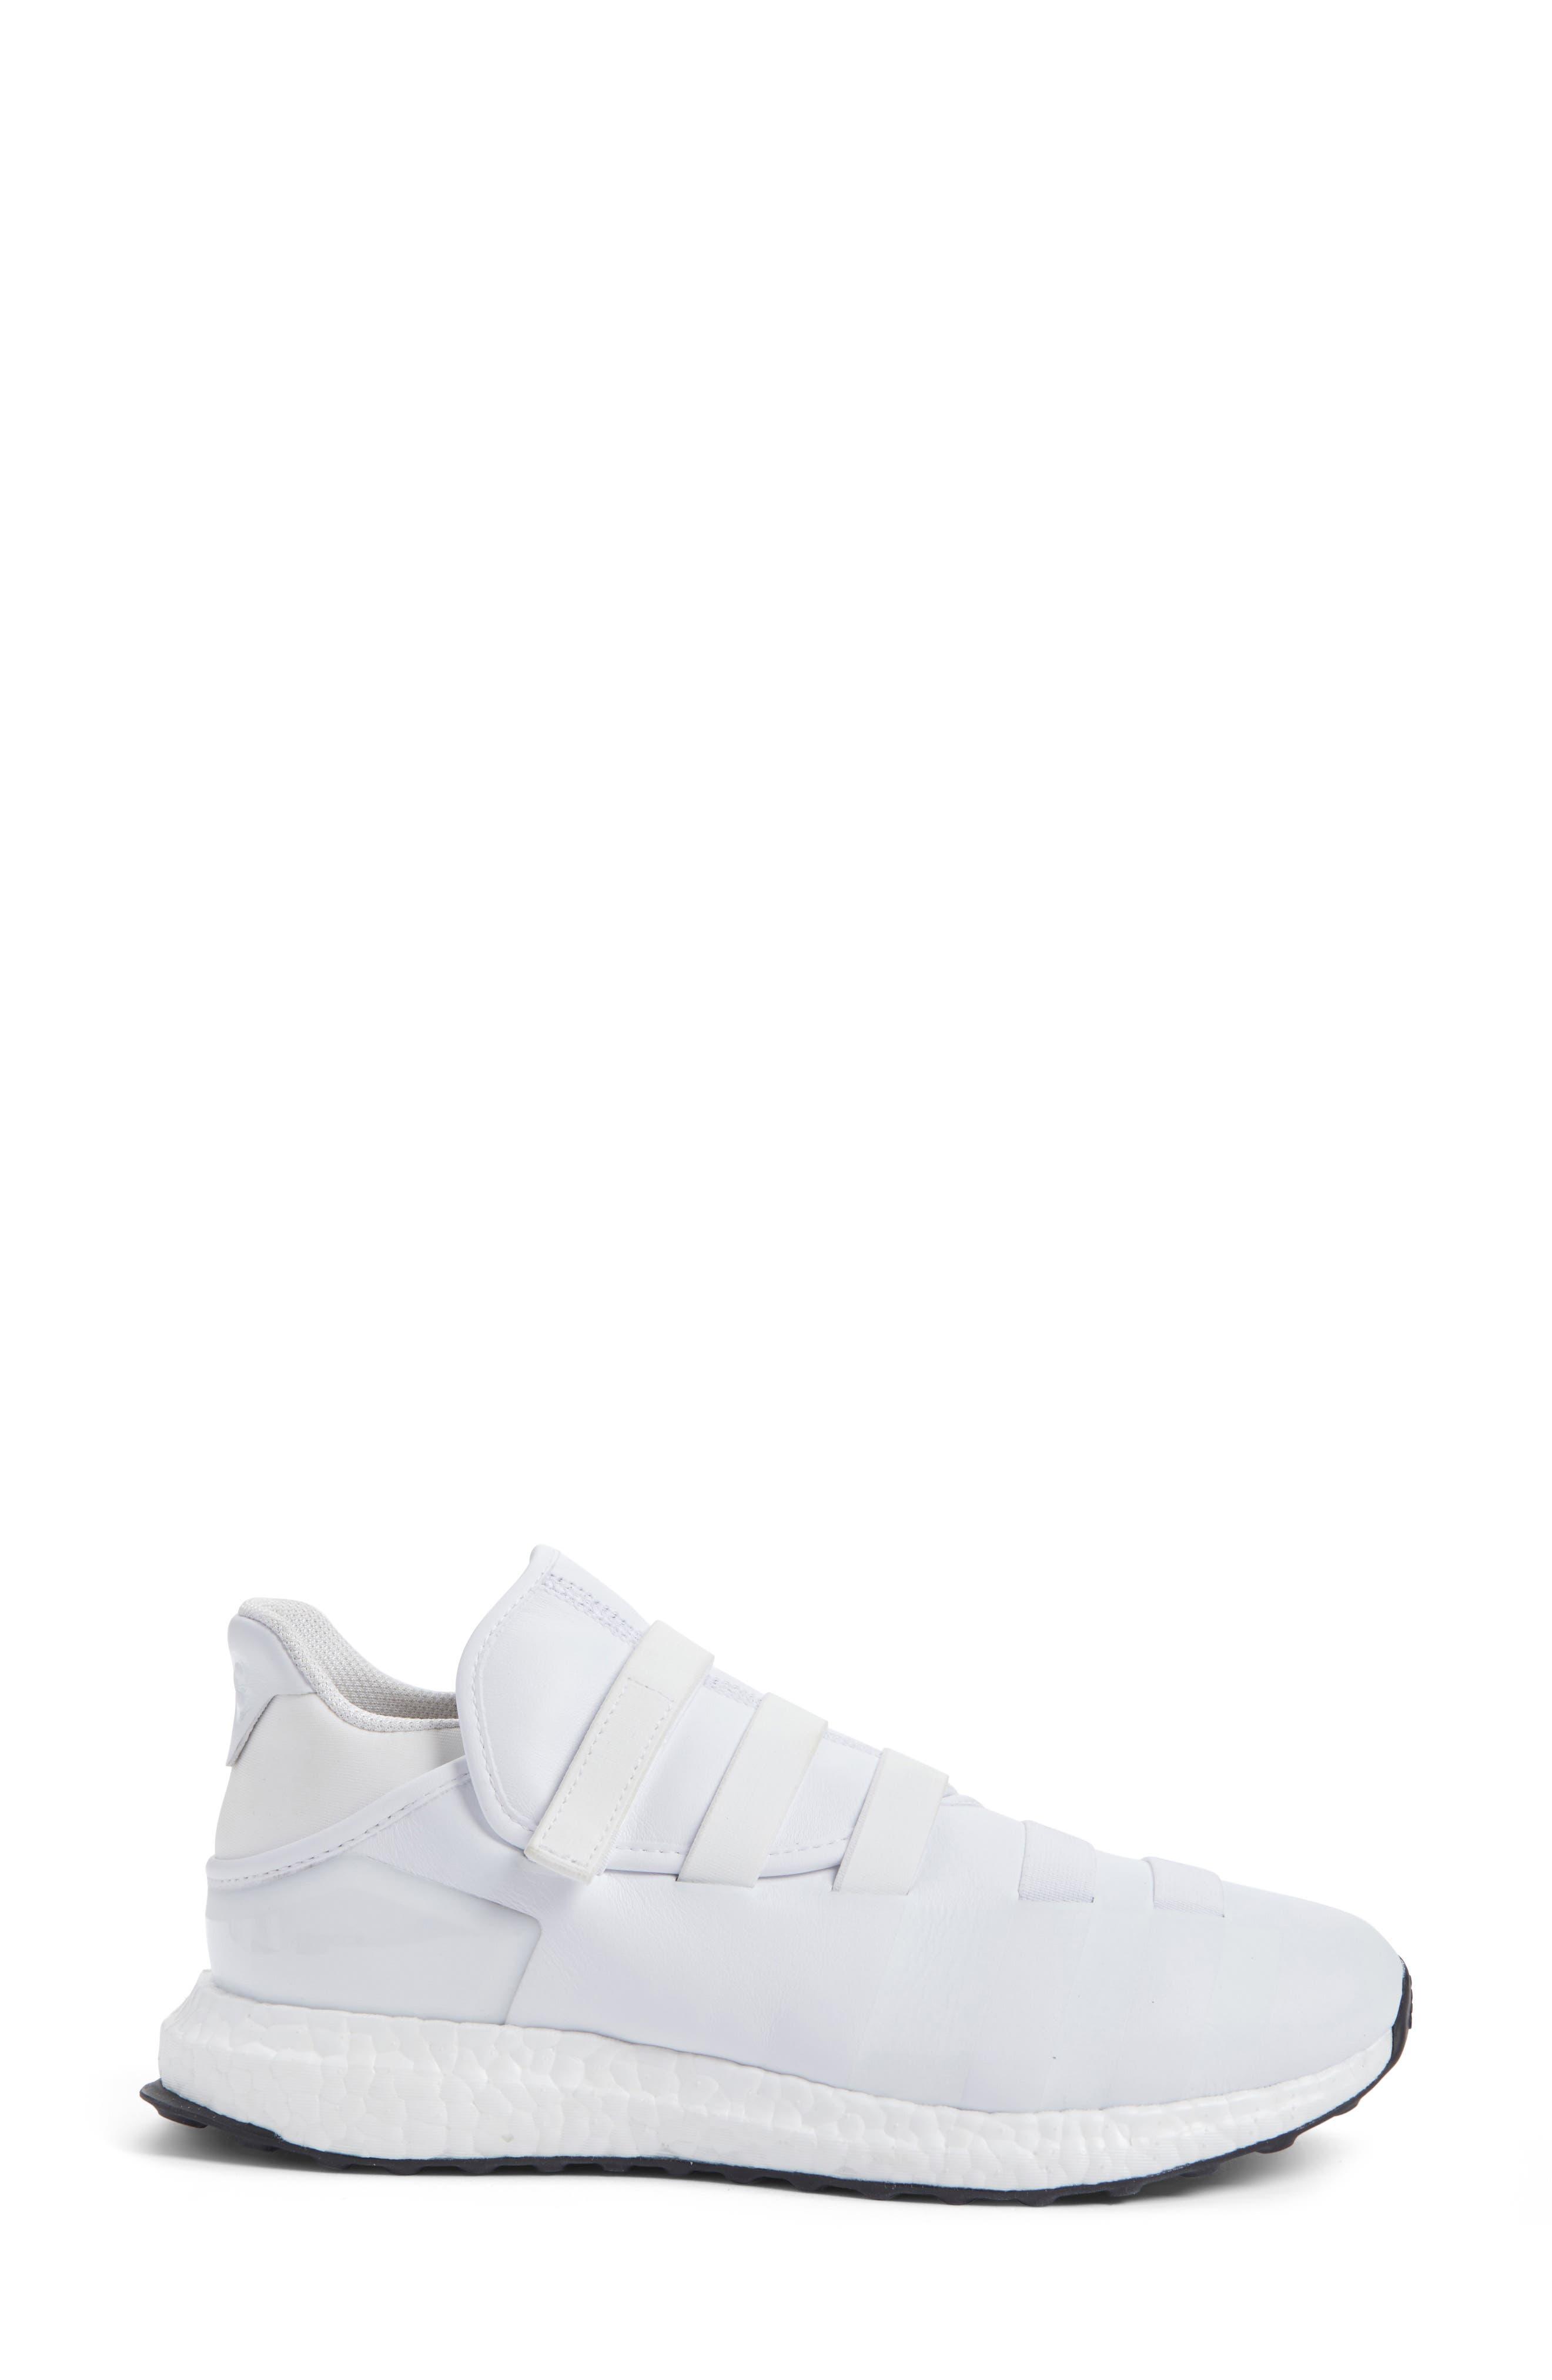 Zazu Strappy Sneaker,                             Alternate thumbnail 3, color,                             100